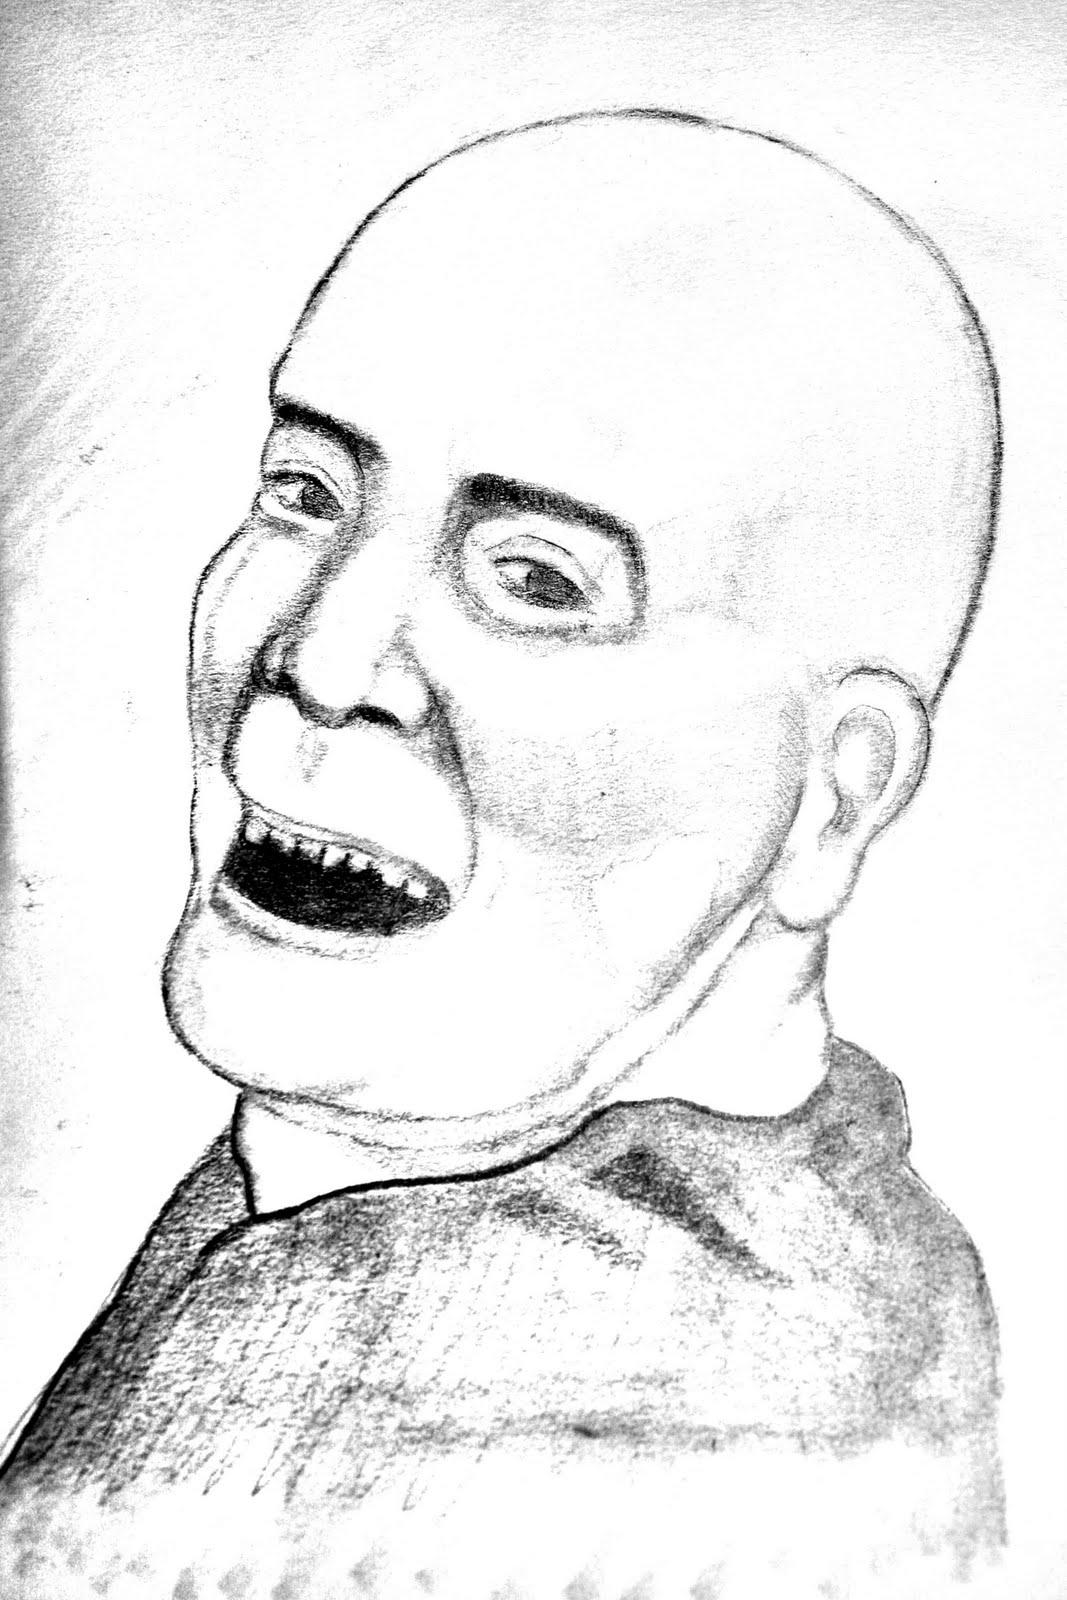 Inversus Art: From the Sketchbook... Part Five